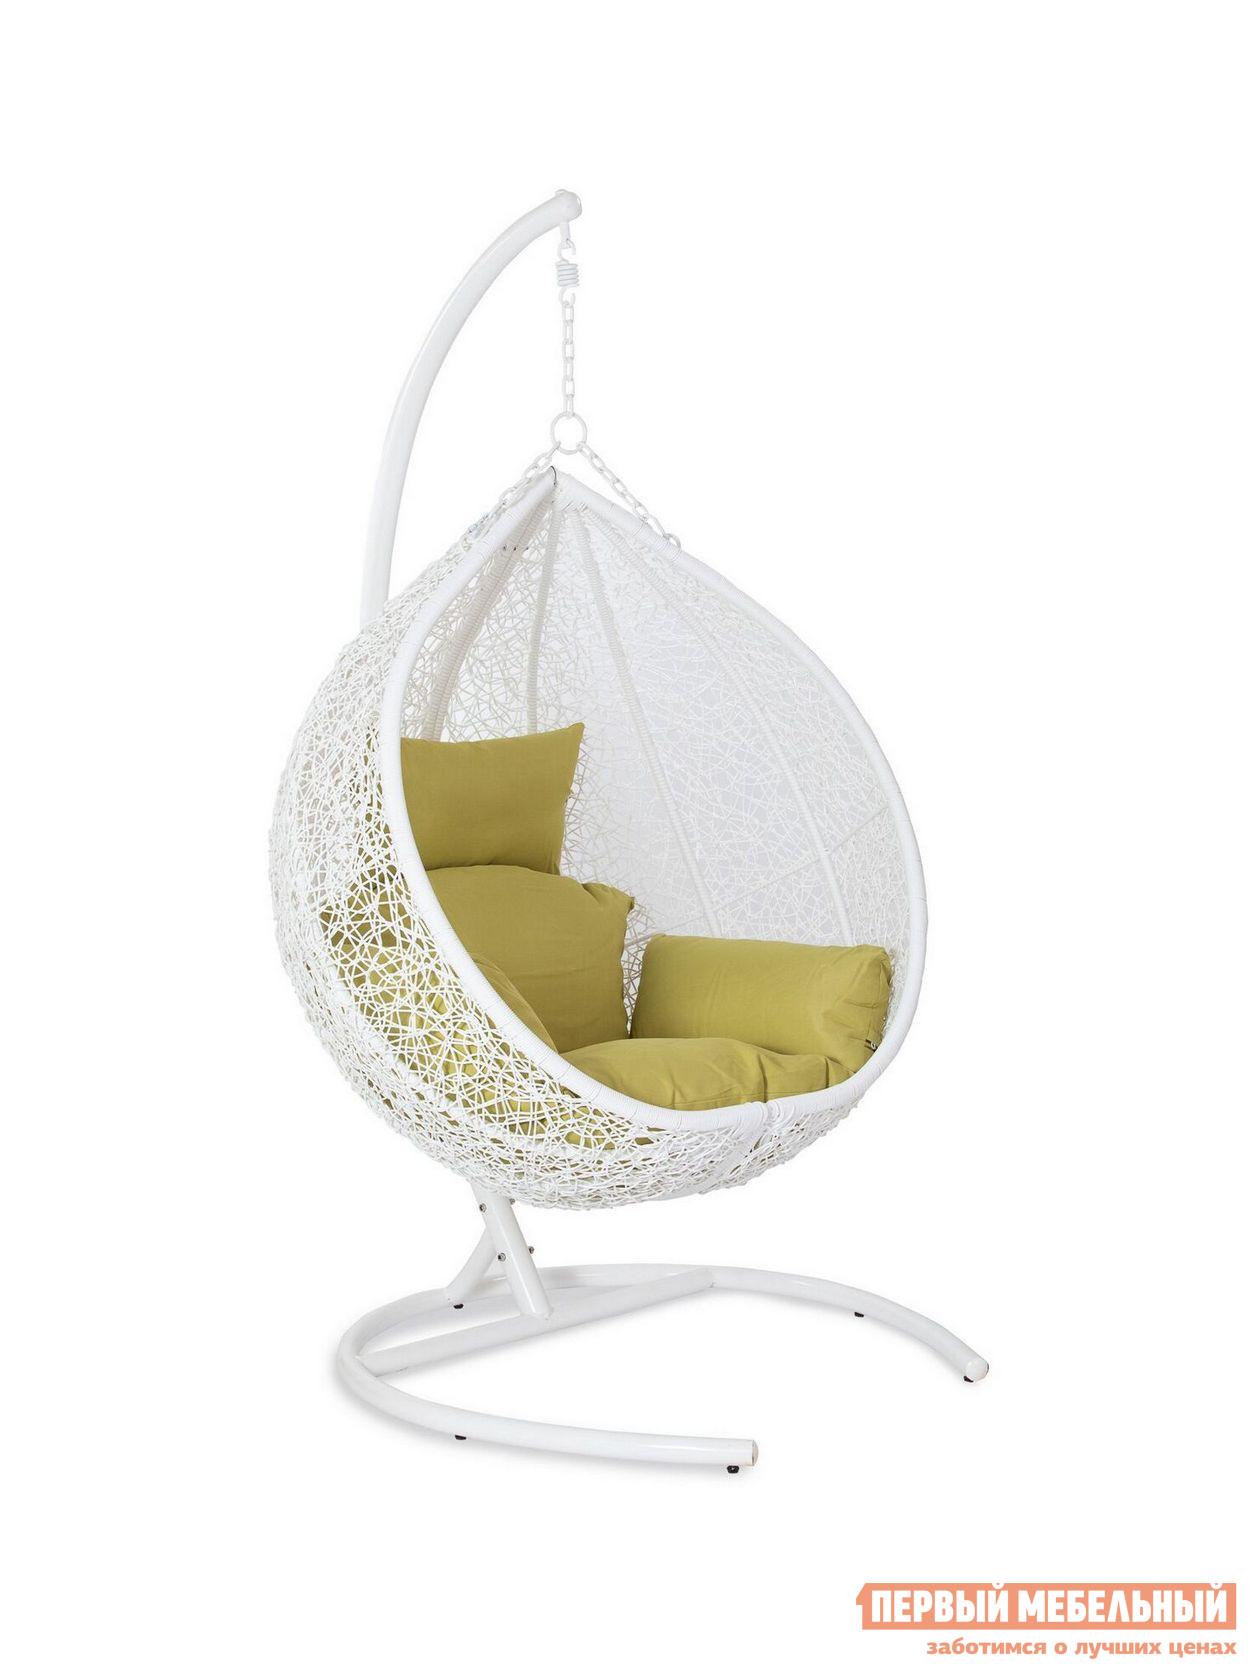 Подвесное кресло ЭкоДизайн ORION Y0069 кресло подвесное экодизайн z 03 b